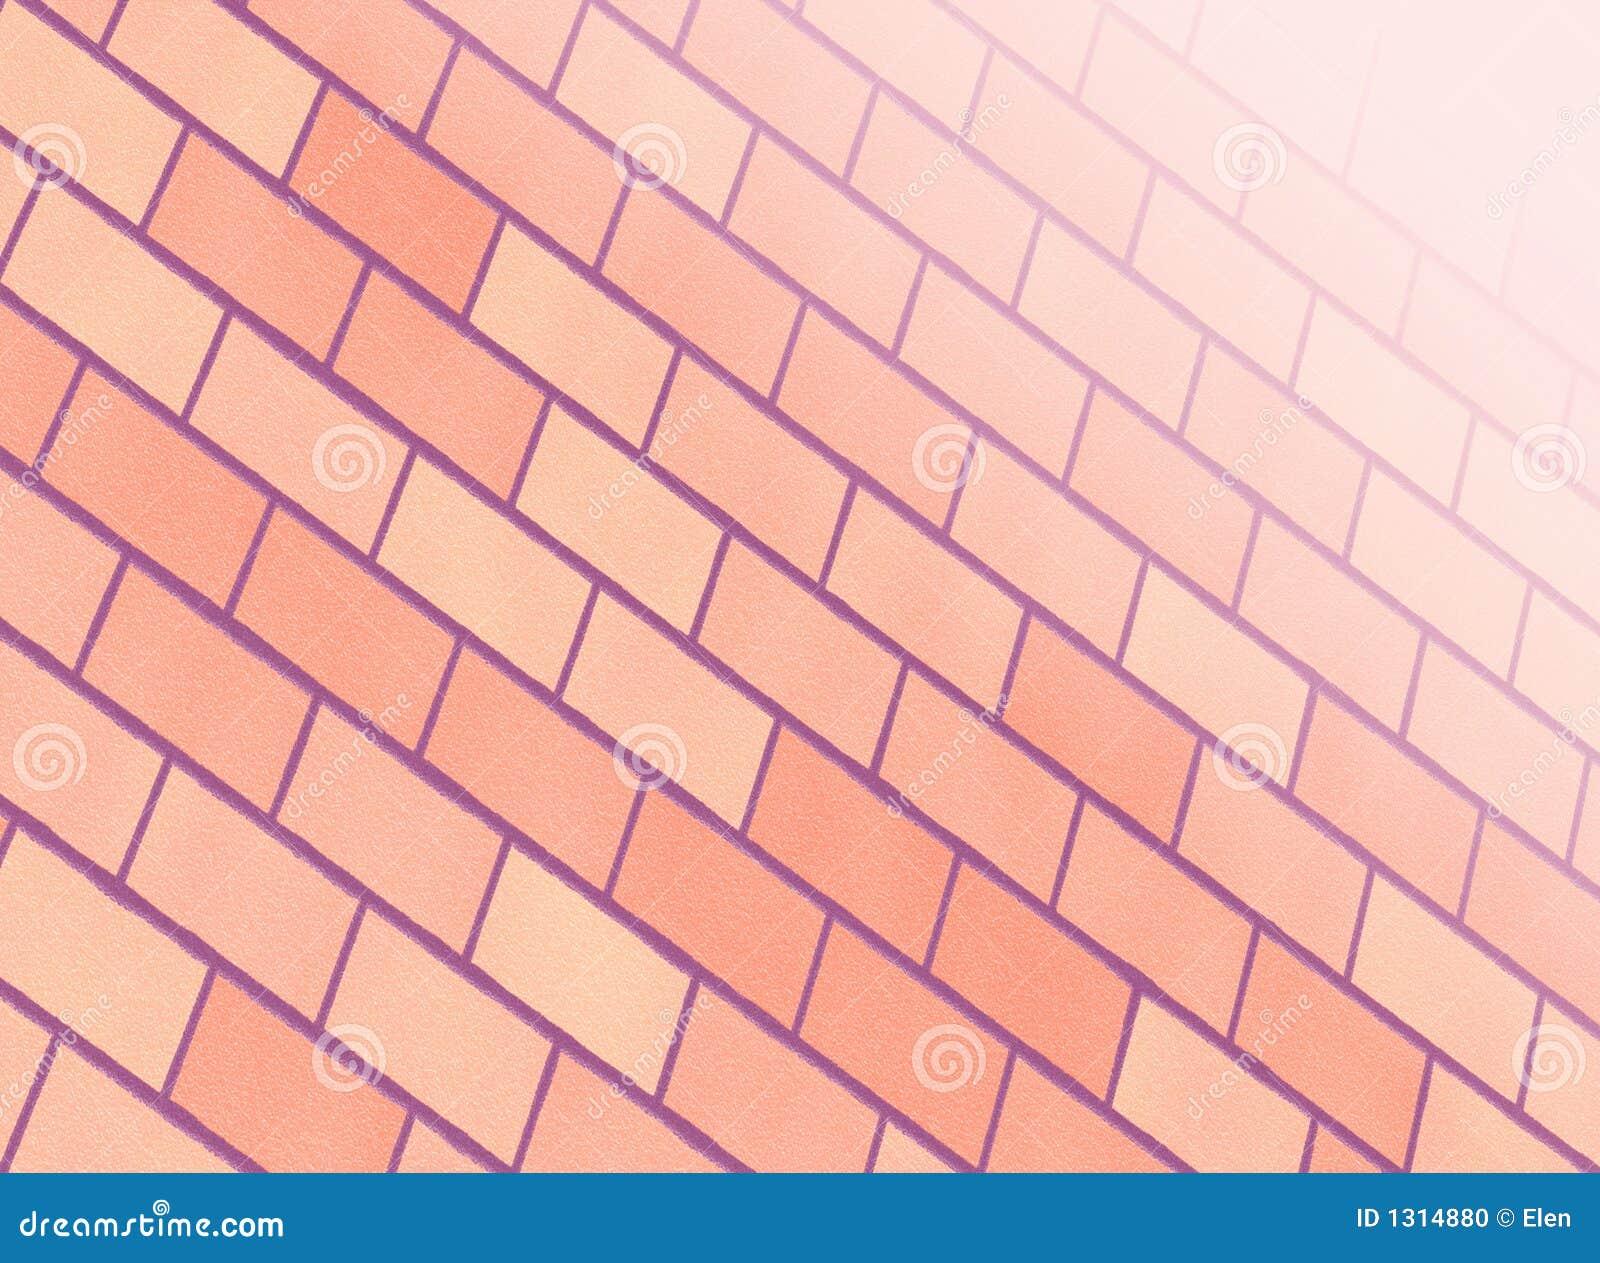 mur de briques rose photo stock image 1314880. Black Bedroom Furniture Sets. Home Design Ideas